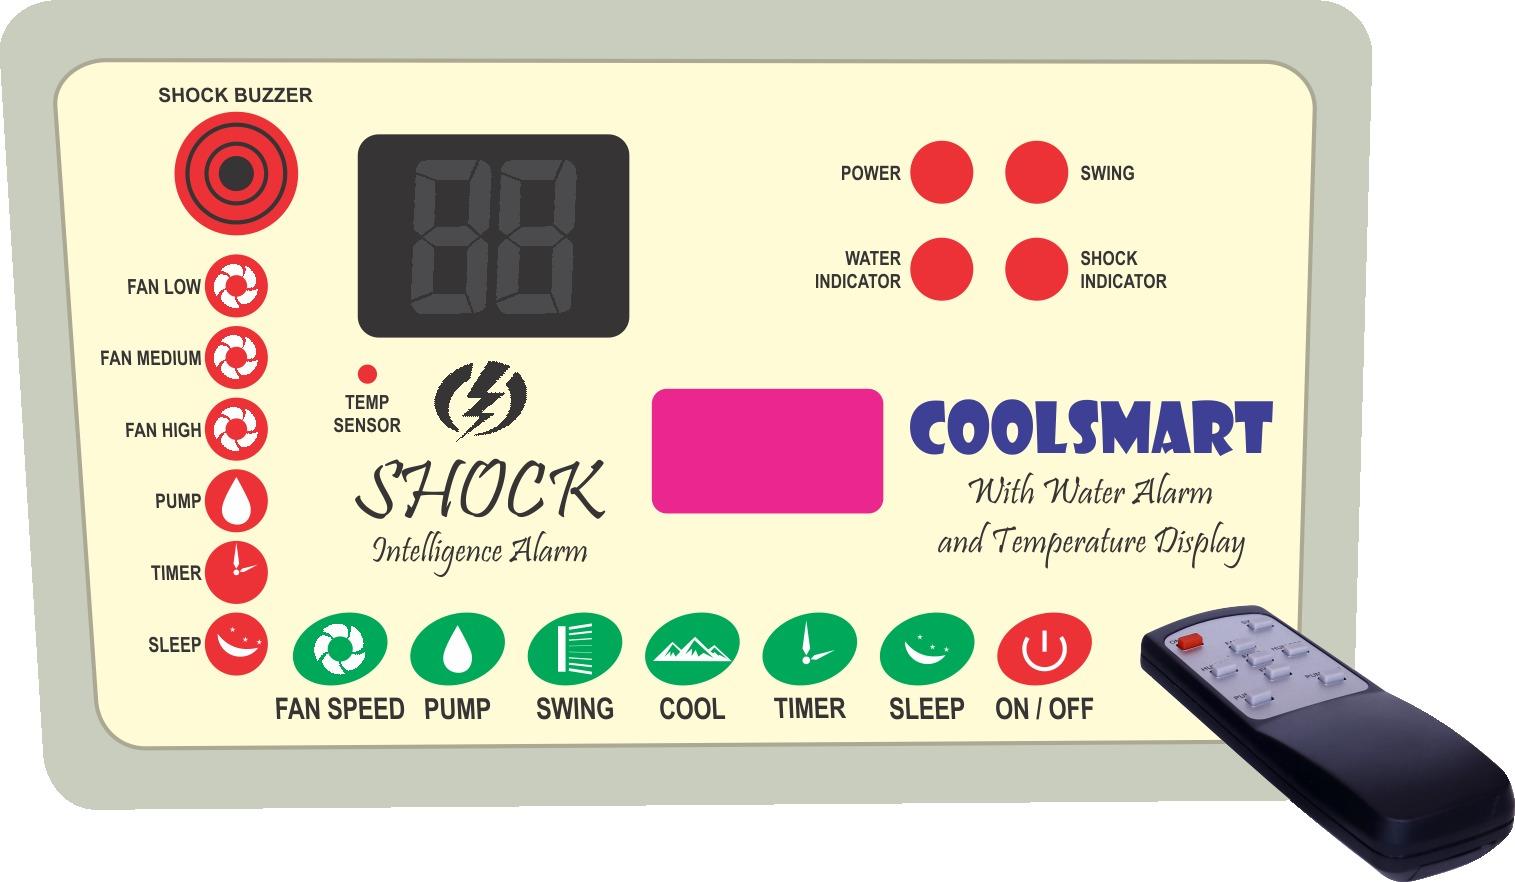 DESRET cooler remote control with water alarm